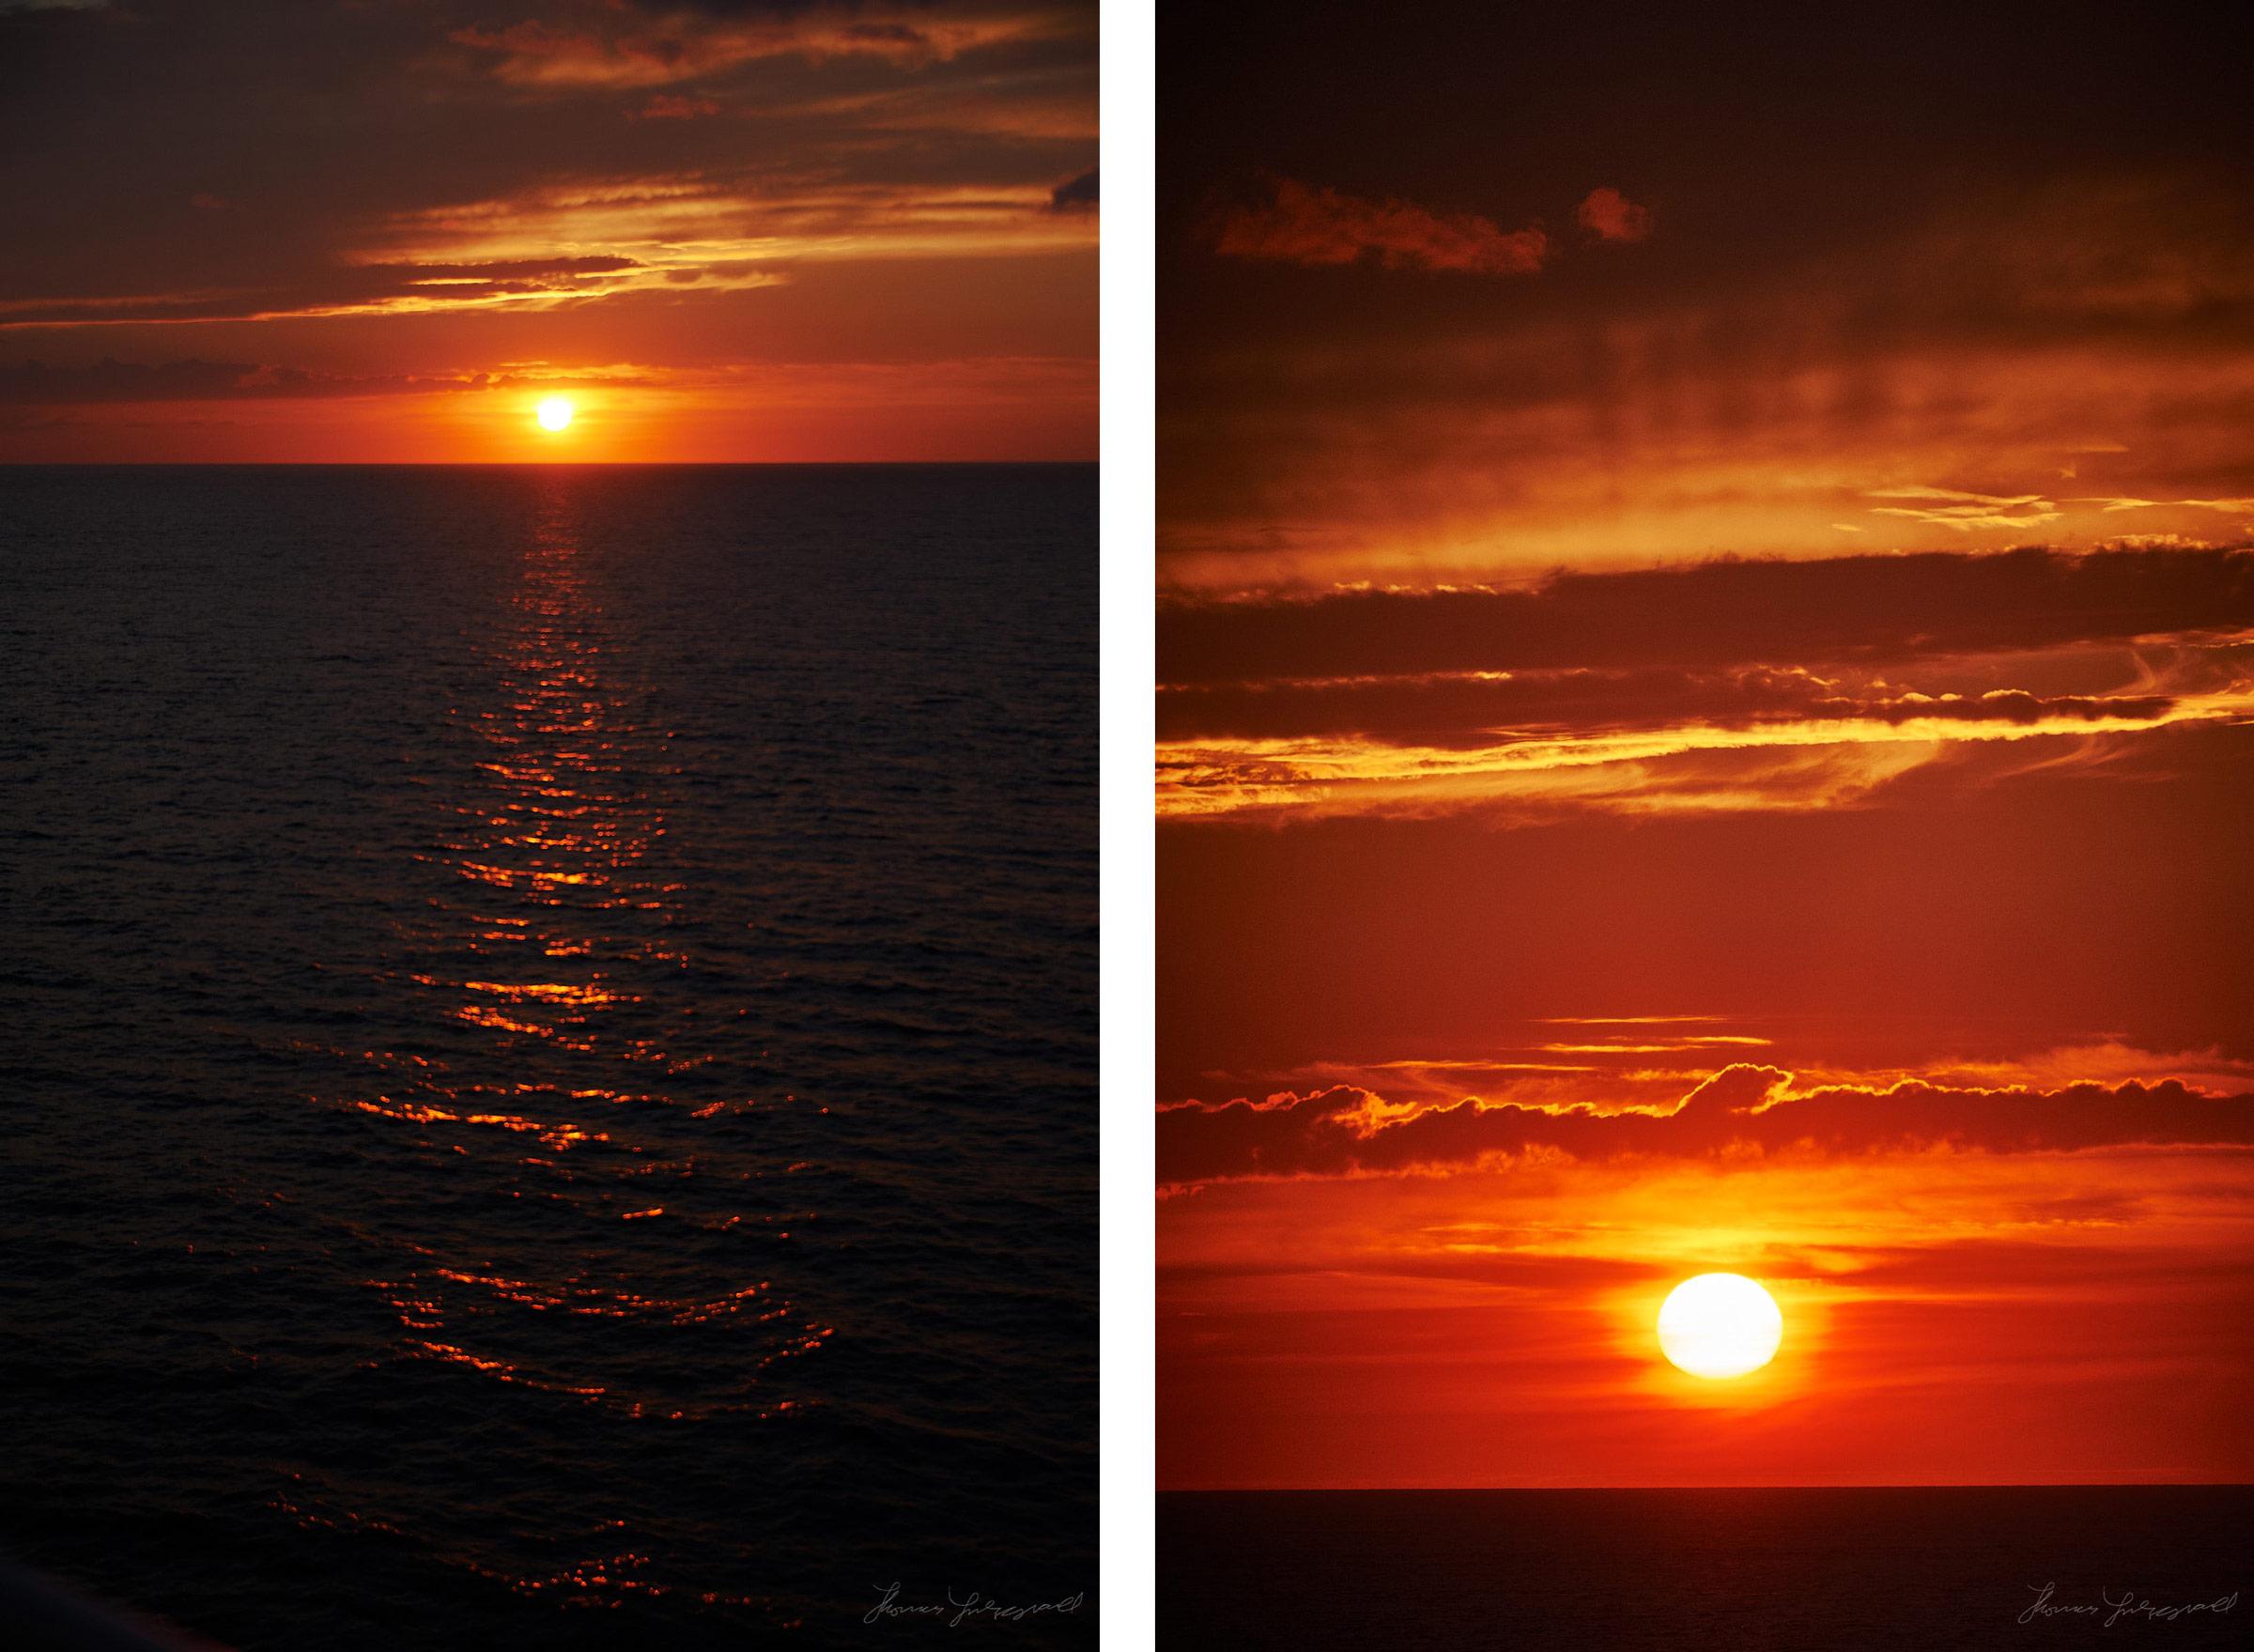 Sunset-Over-Irish-Sea-Two-Up1.jpg